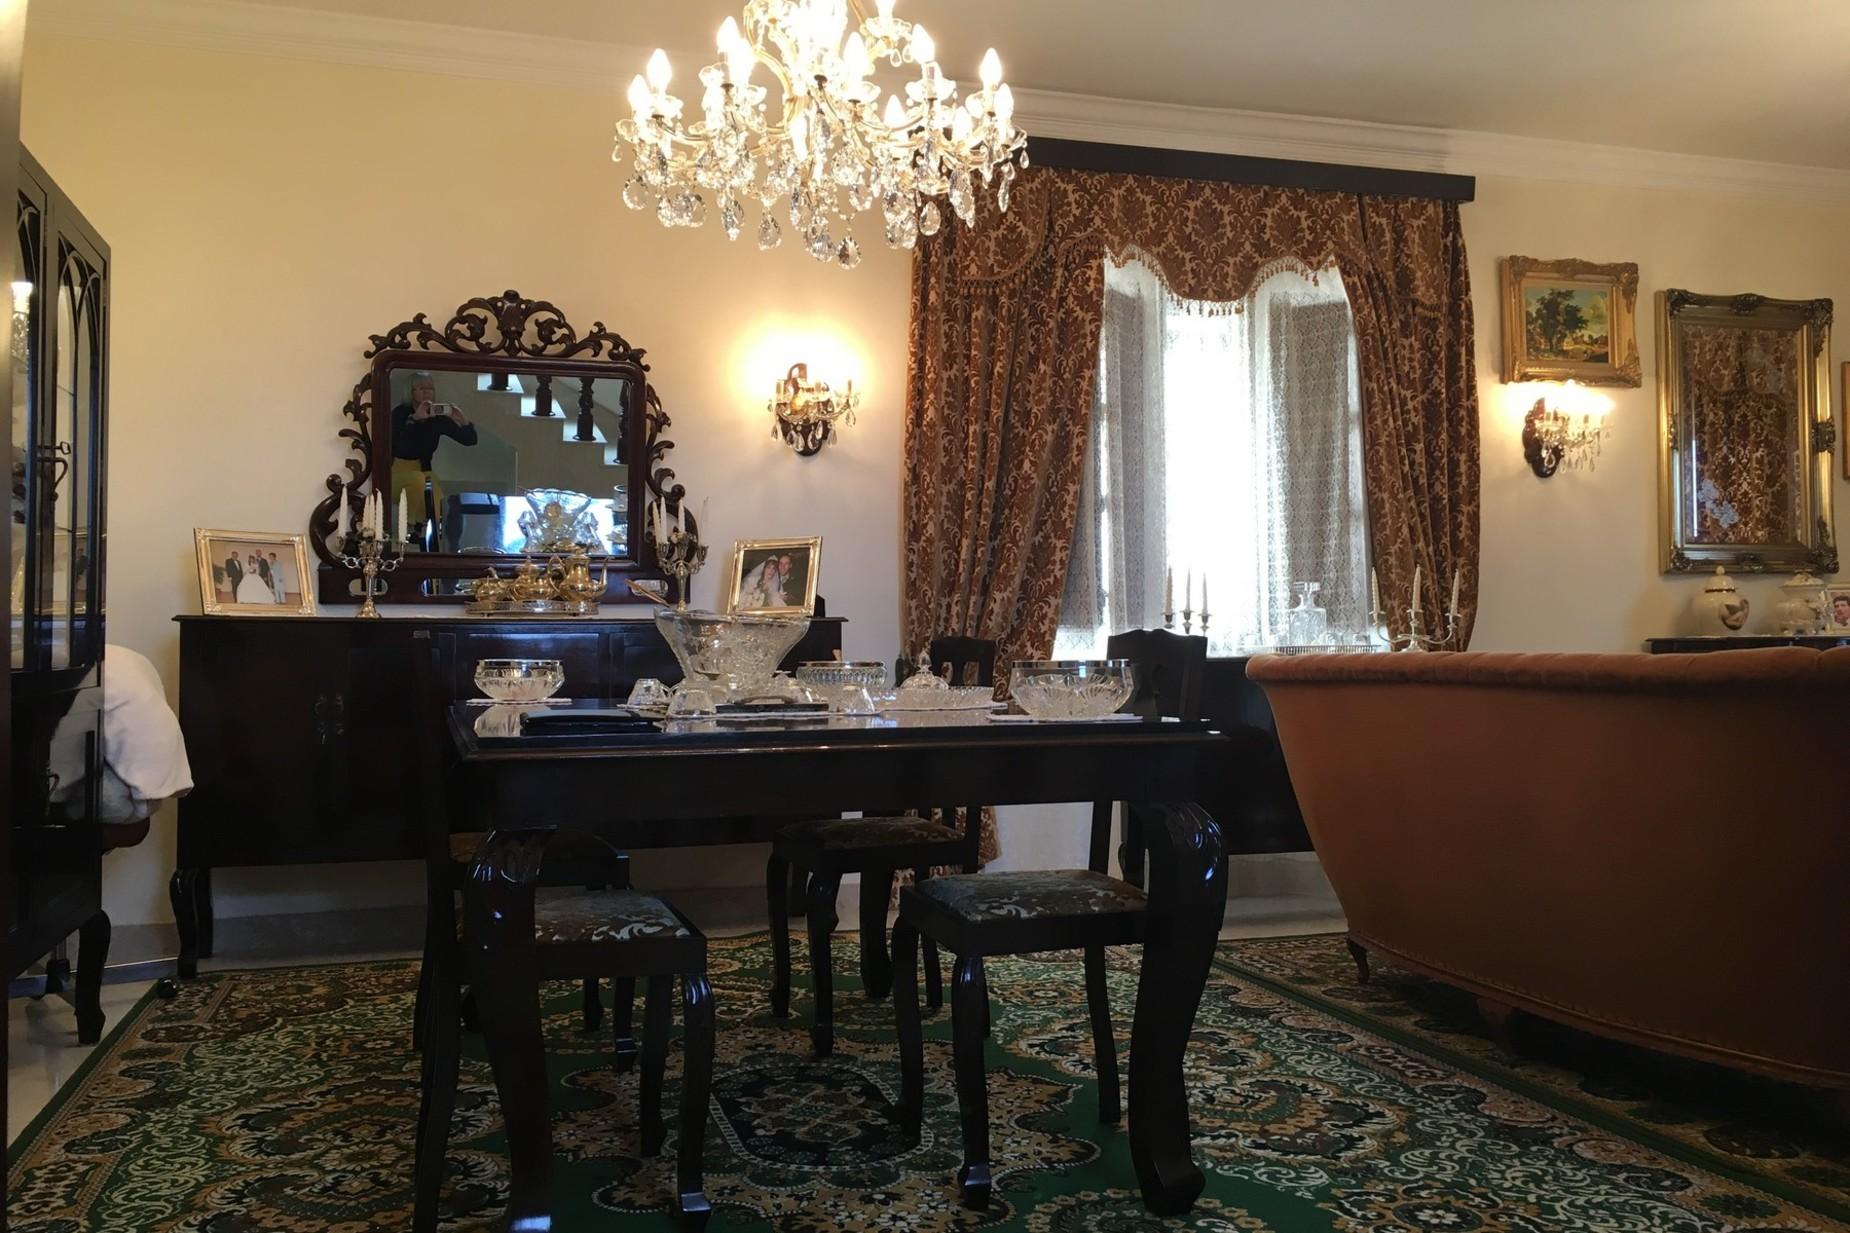 3 bed Villa For Sale in Attard, Attard - thumb 5